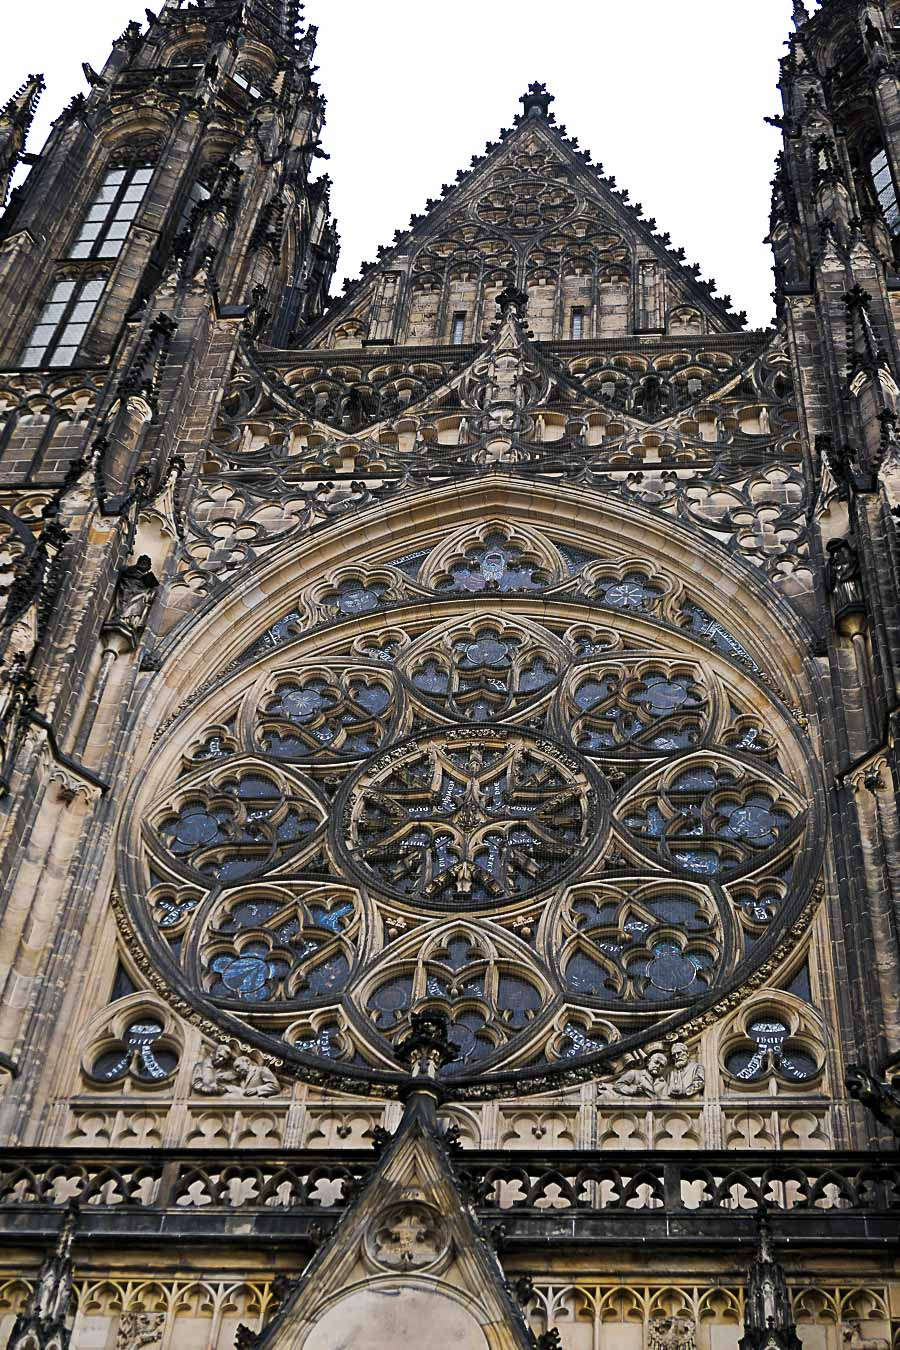 Prague Architecture Photos - St. Vitus Cathedral